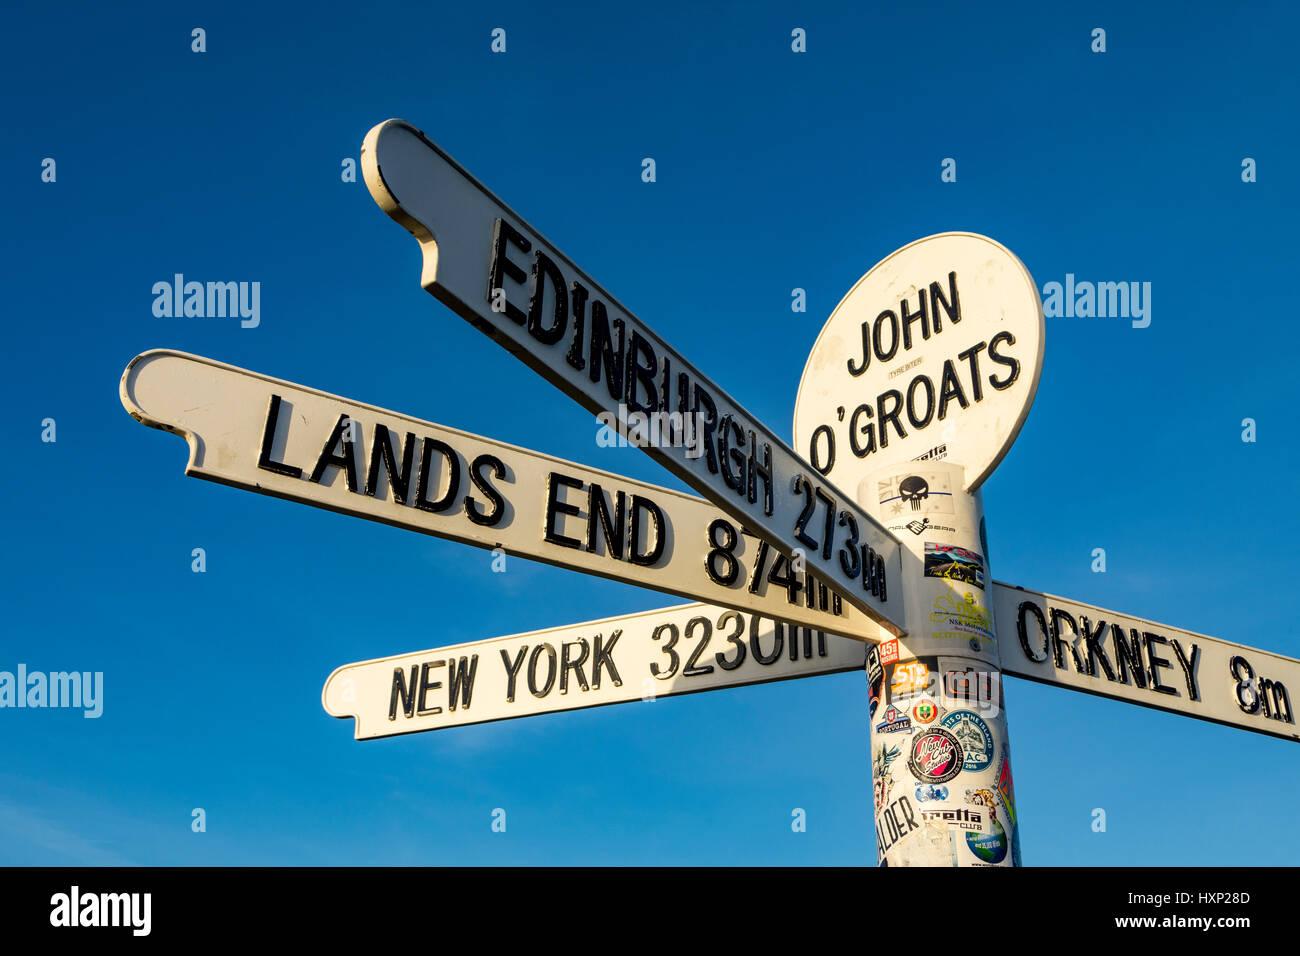 The signpost at John o' Groats, Caithness, Scotland, UK Stock Photo